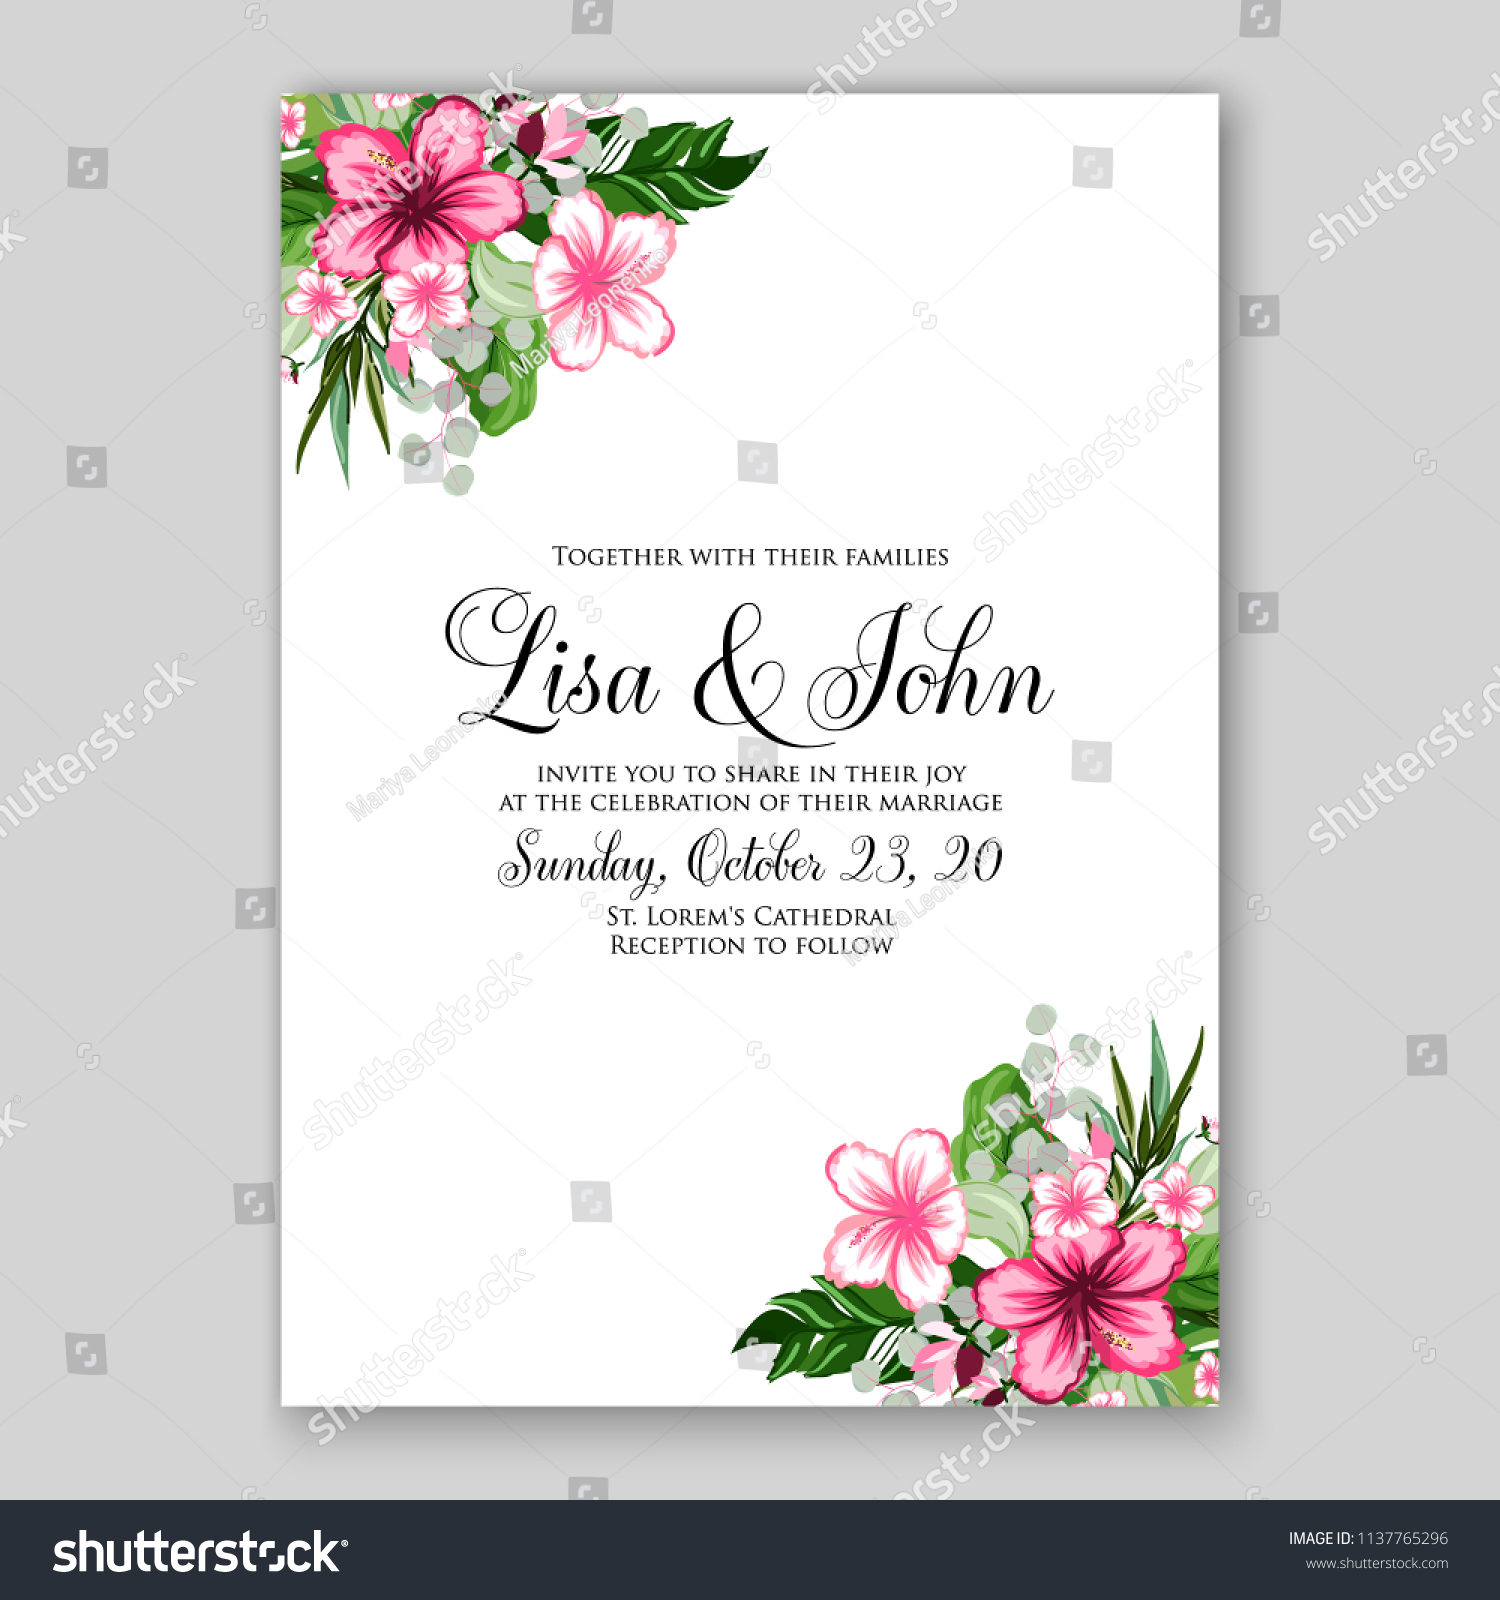 Floral Wedding Invitation Printable Template Card Stock Vector ...